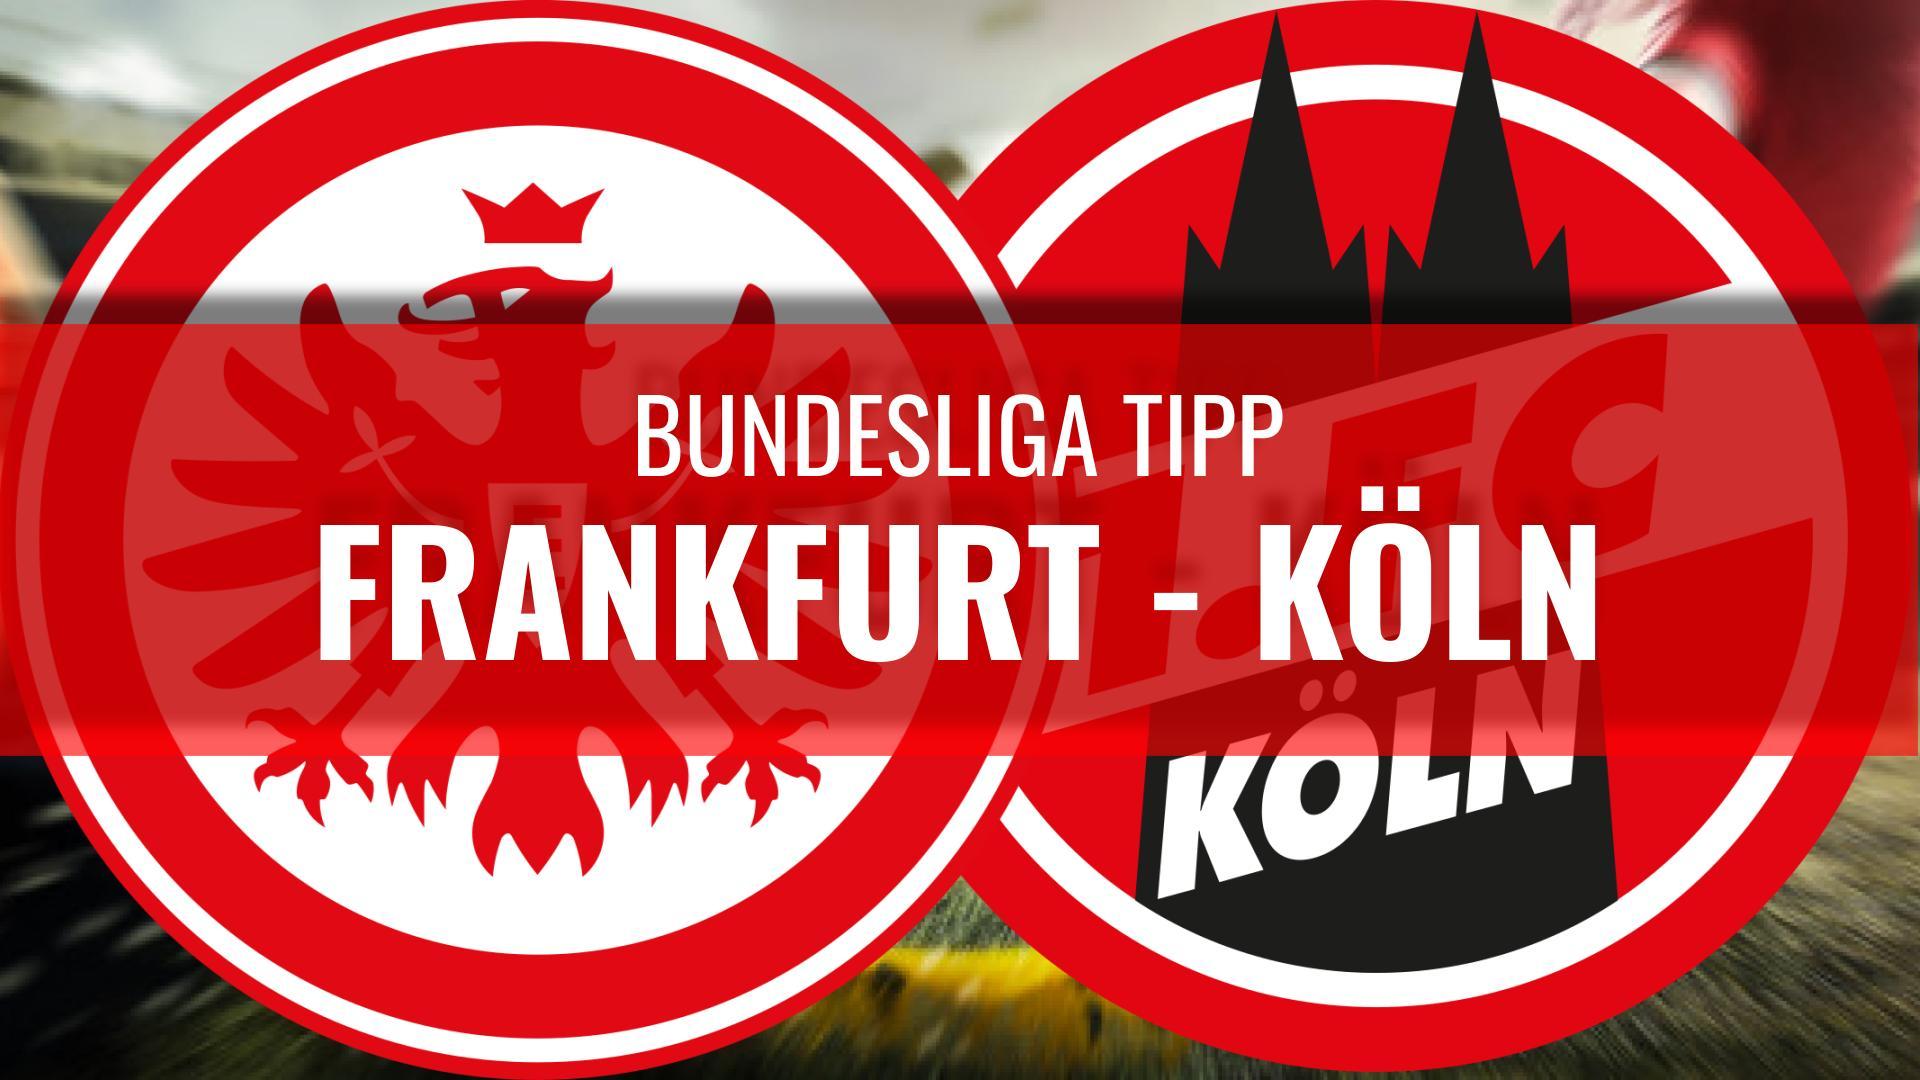 FRANKFURT - KÖLN-Bundesliga-Wett-Tipps-21